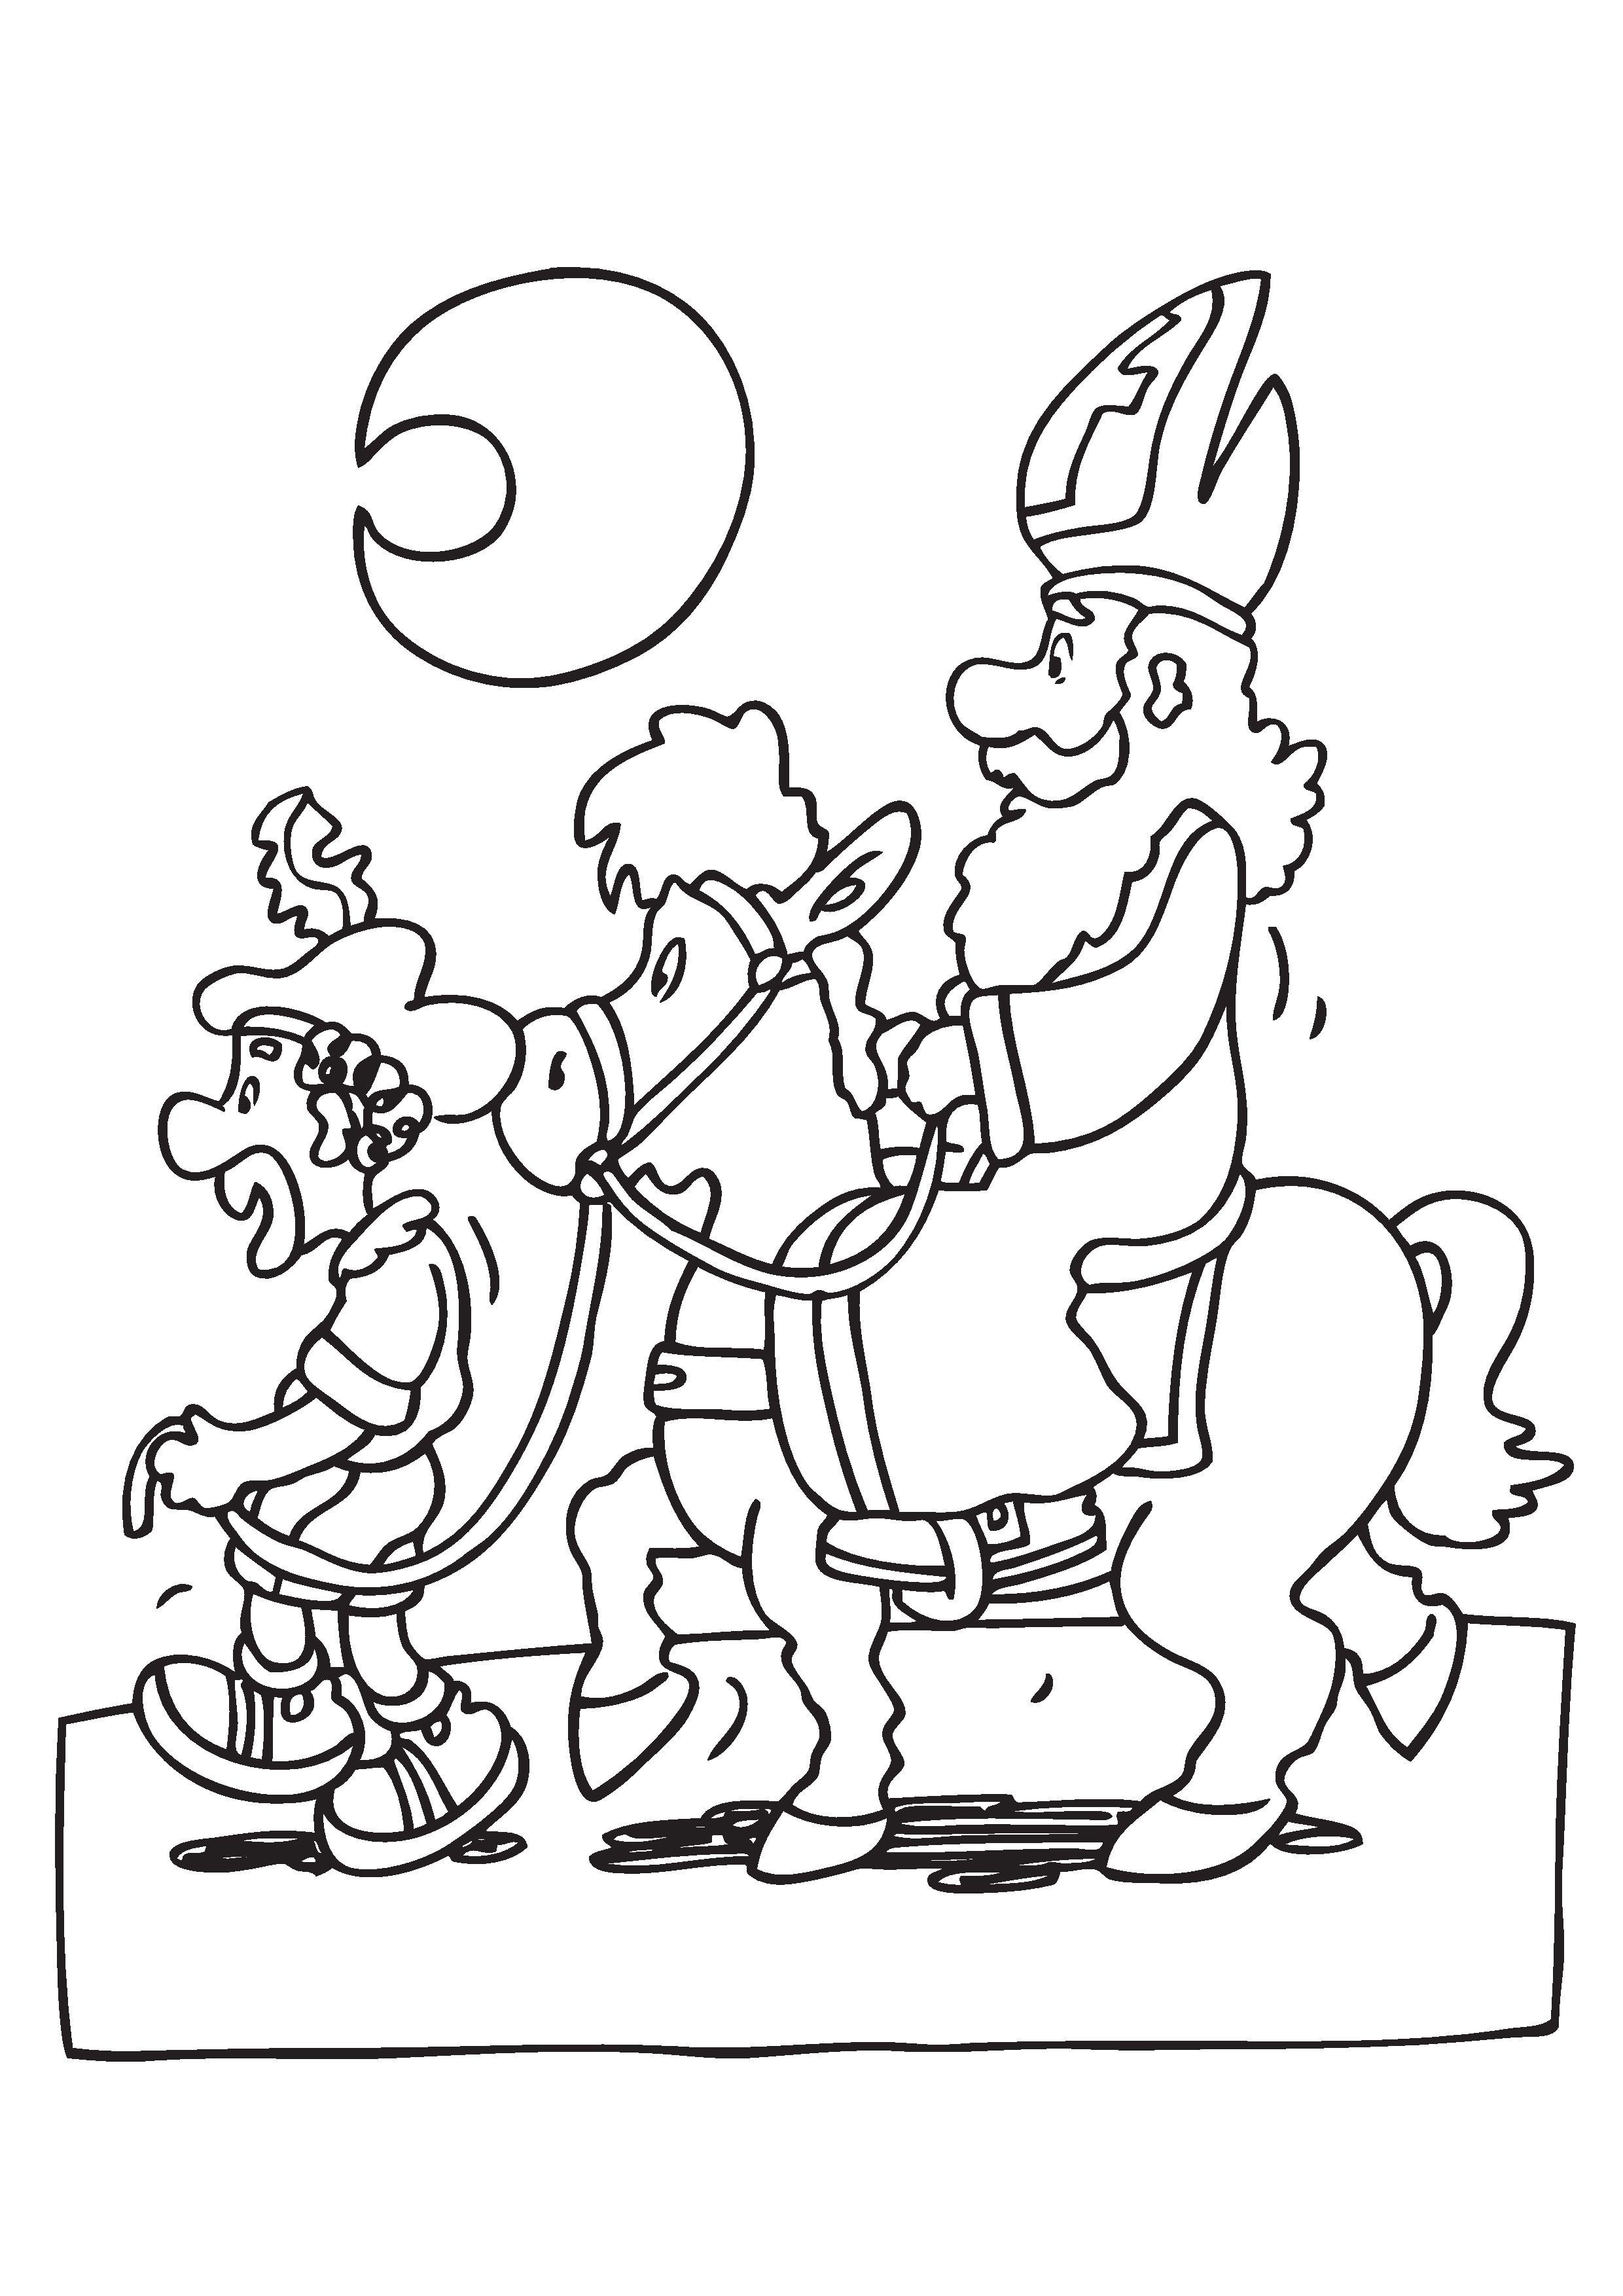 kleurplaat sinterklaas paard 2020 voor peuters en kleuters